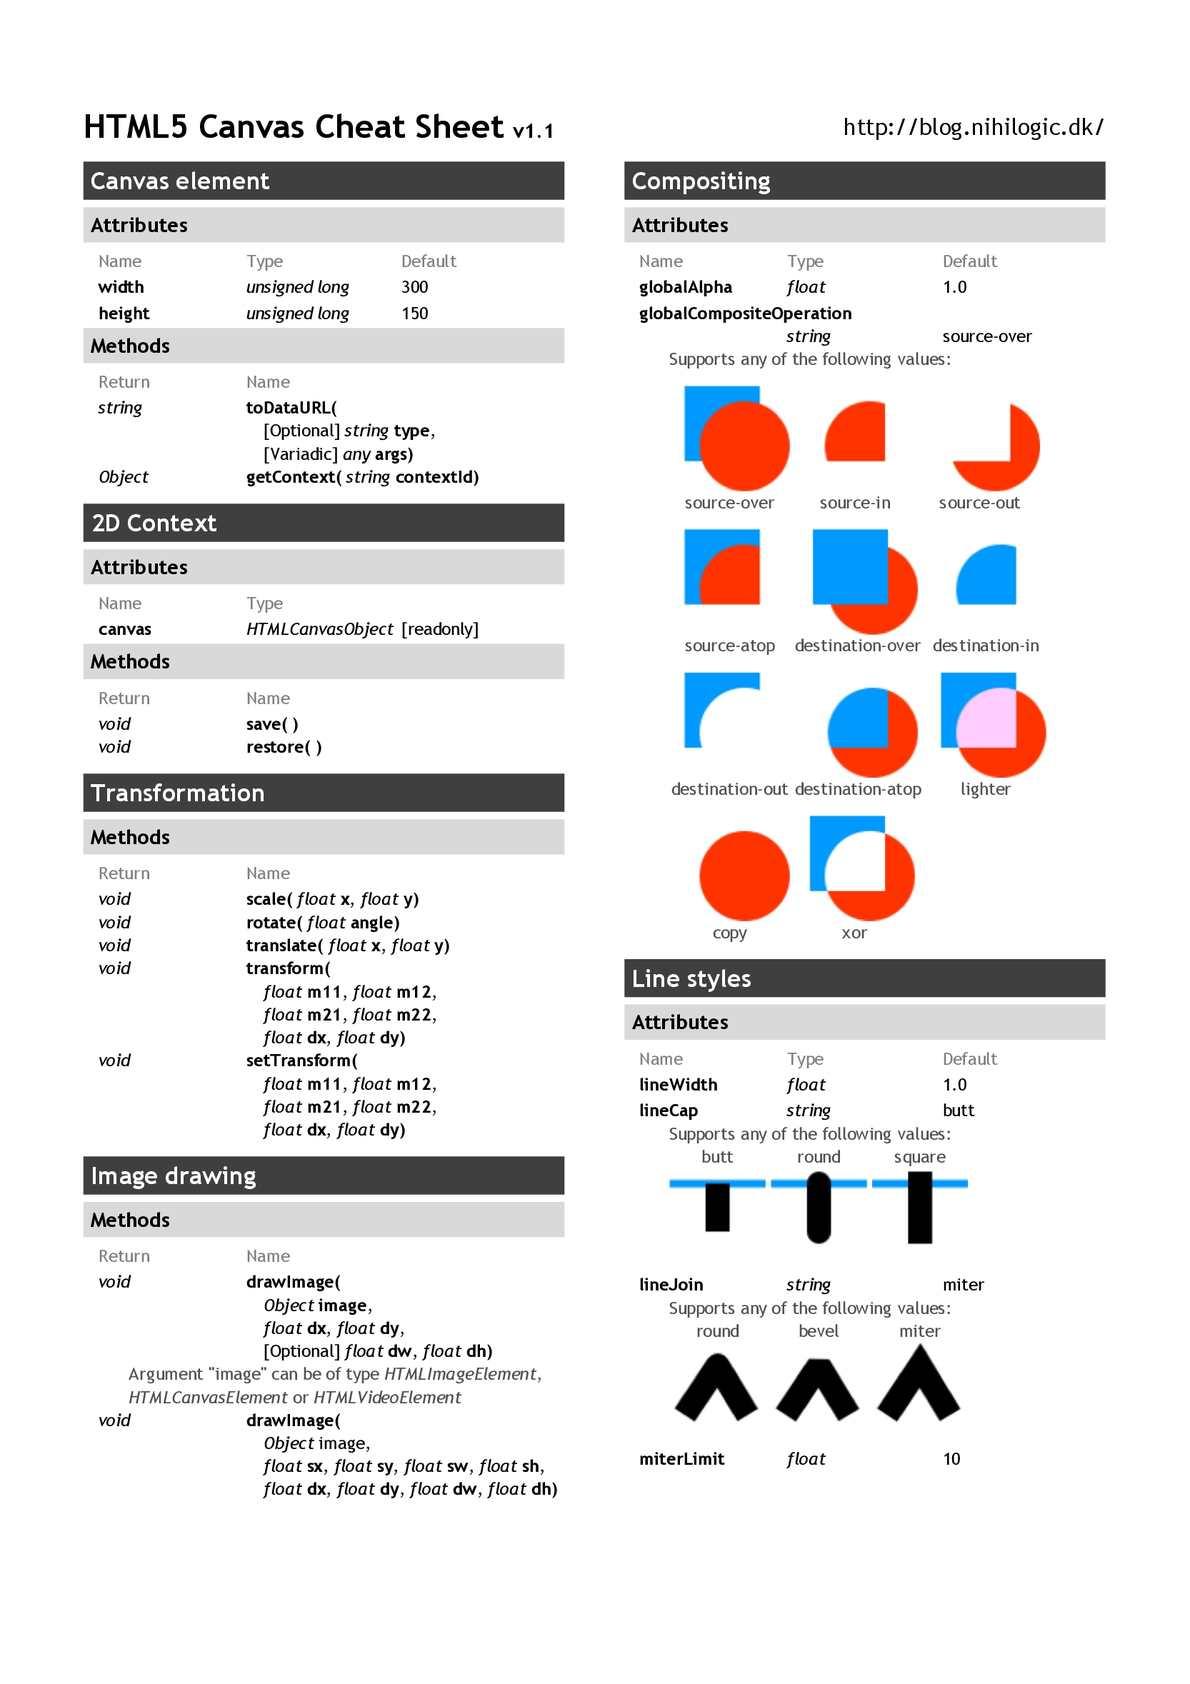 скачать html 5 шпаргалку на русском pdf